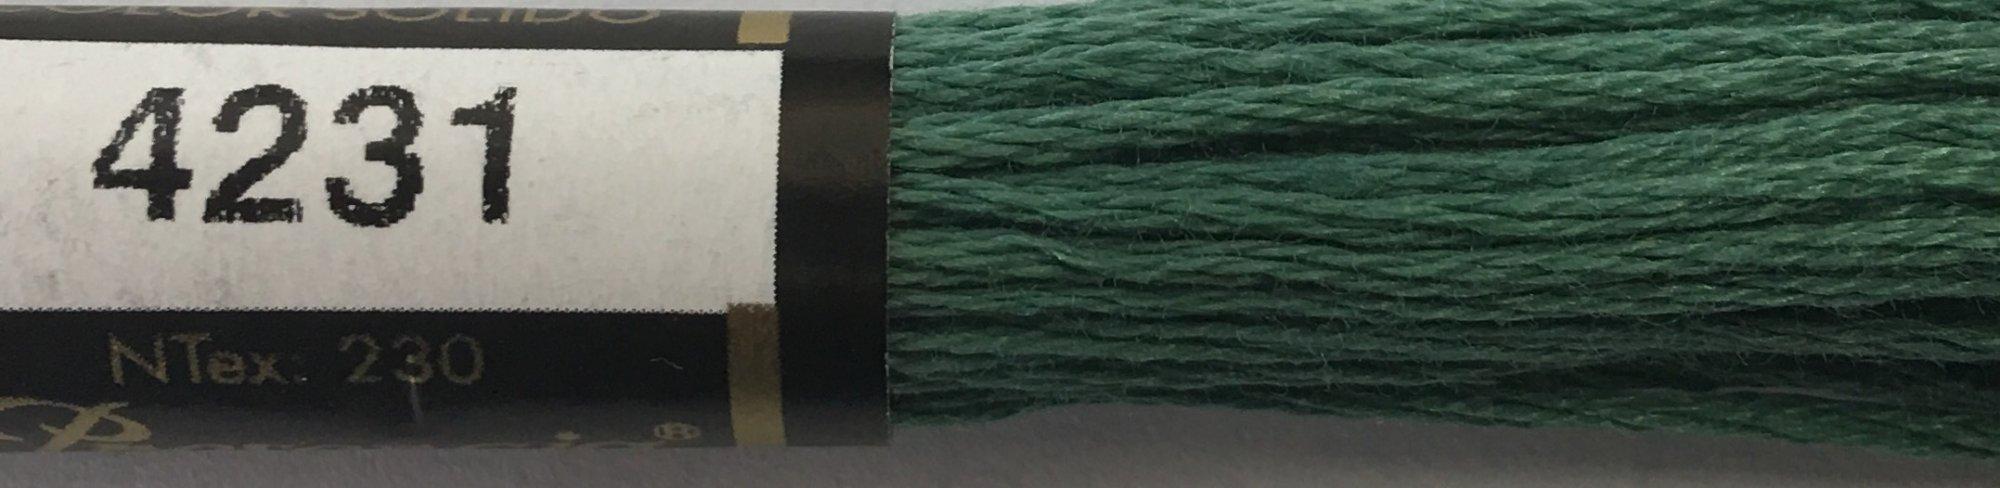 F4231 Presencia 100% Mercerized Finca Cotton 6 ply Embroidery Floss 8 meter skein